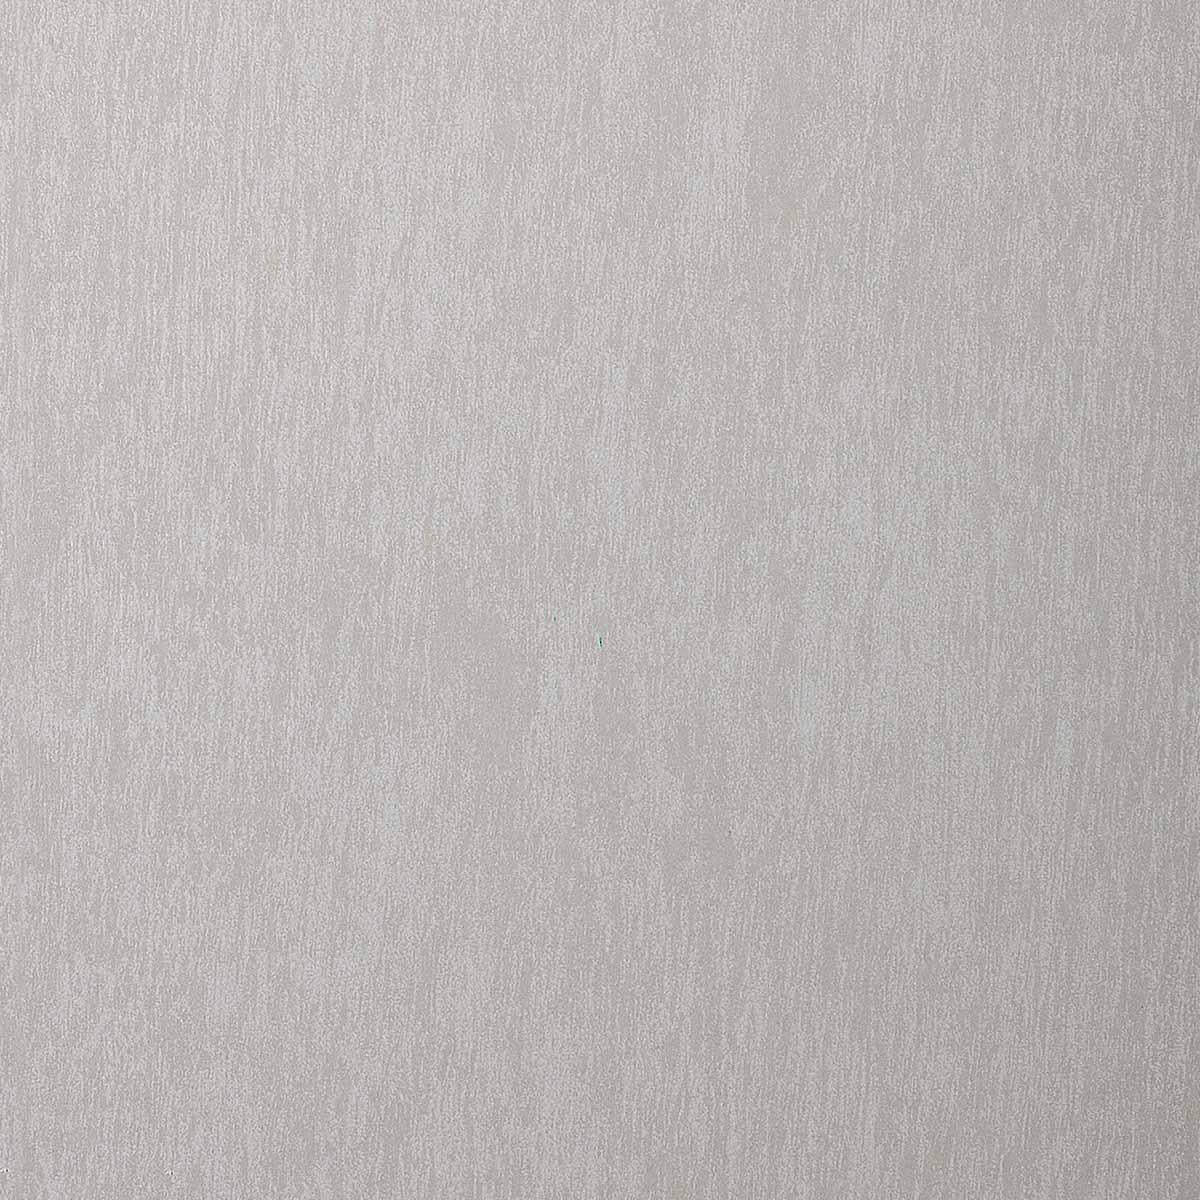 Srie infinity for Carrelage wendel